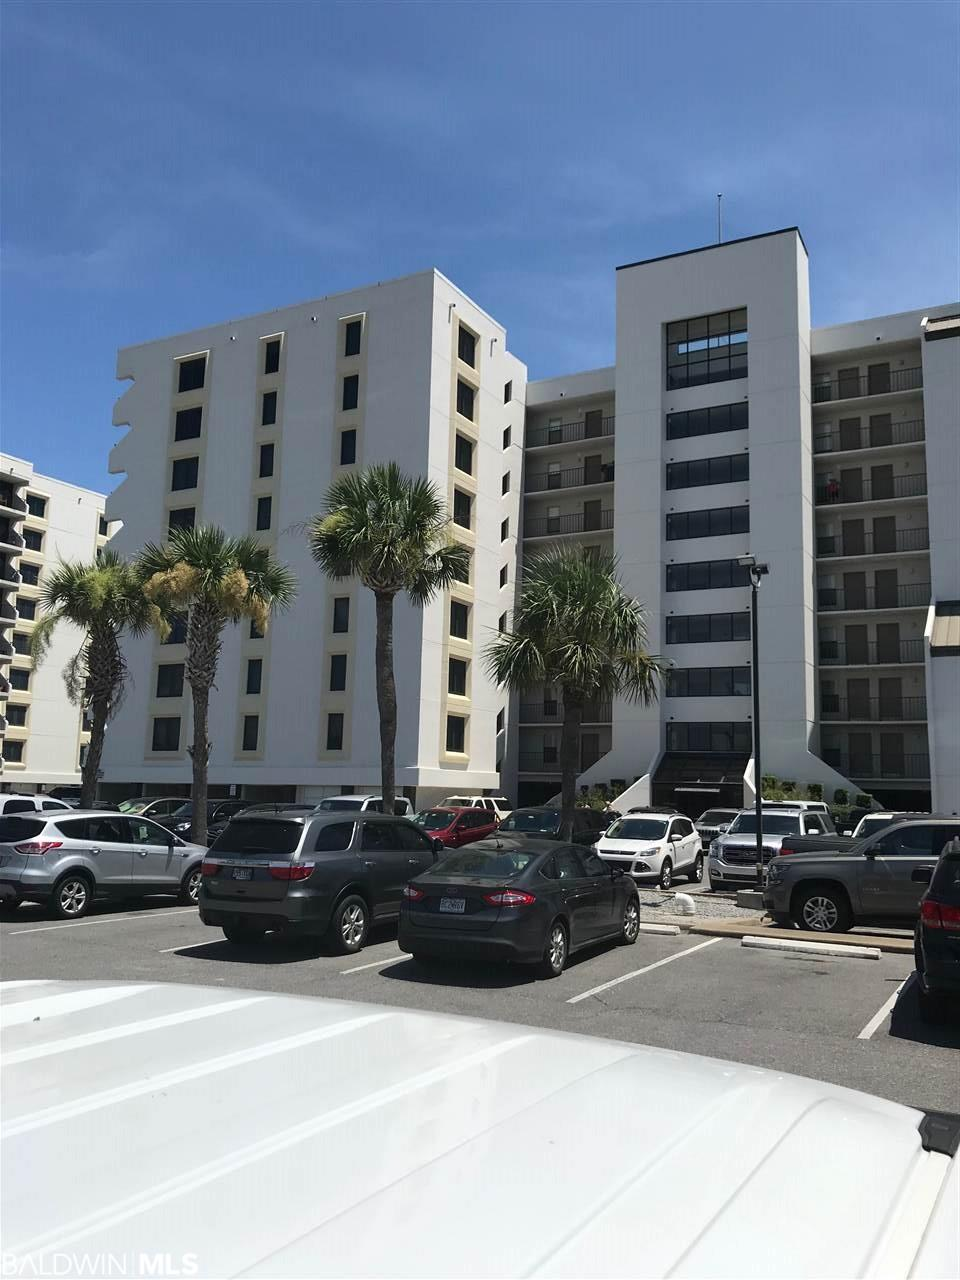 407 Beach Blvd - Photo 1